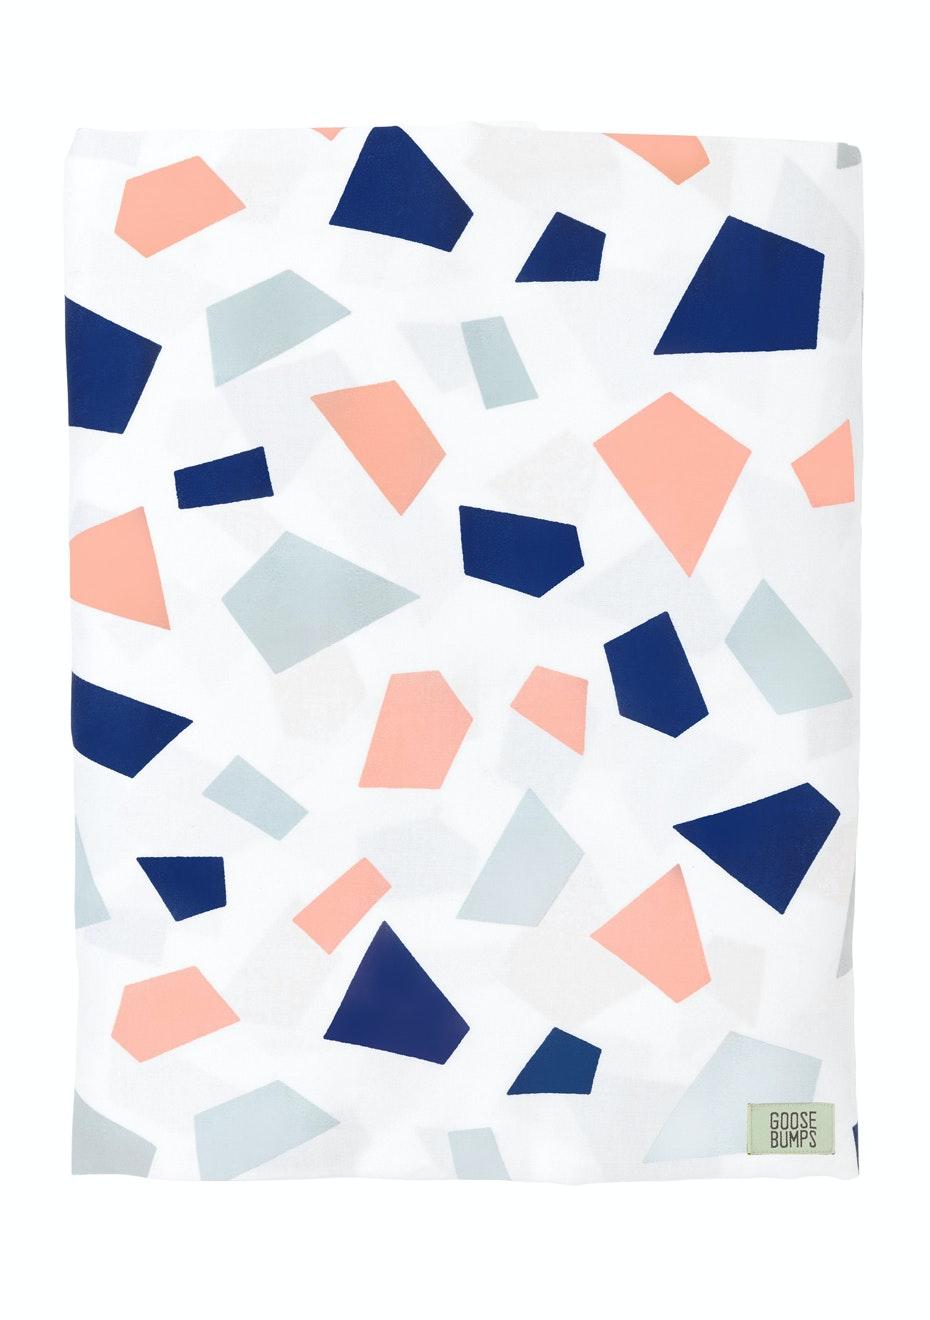 Goosebumps - Flat Sheet - Pop Rocks  - Queen